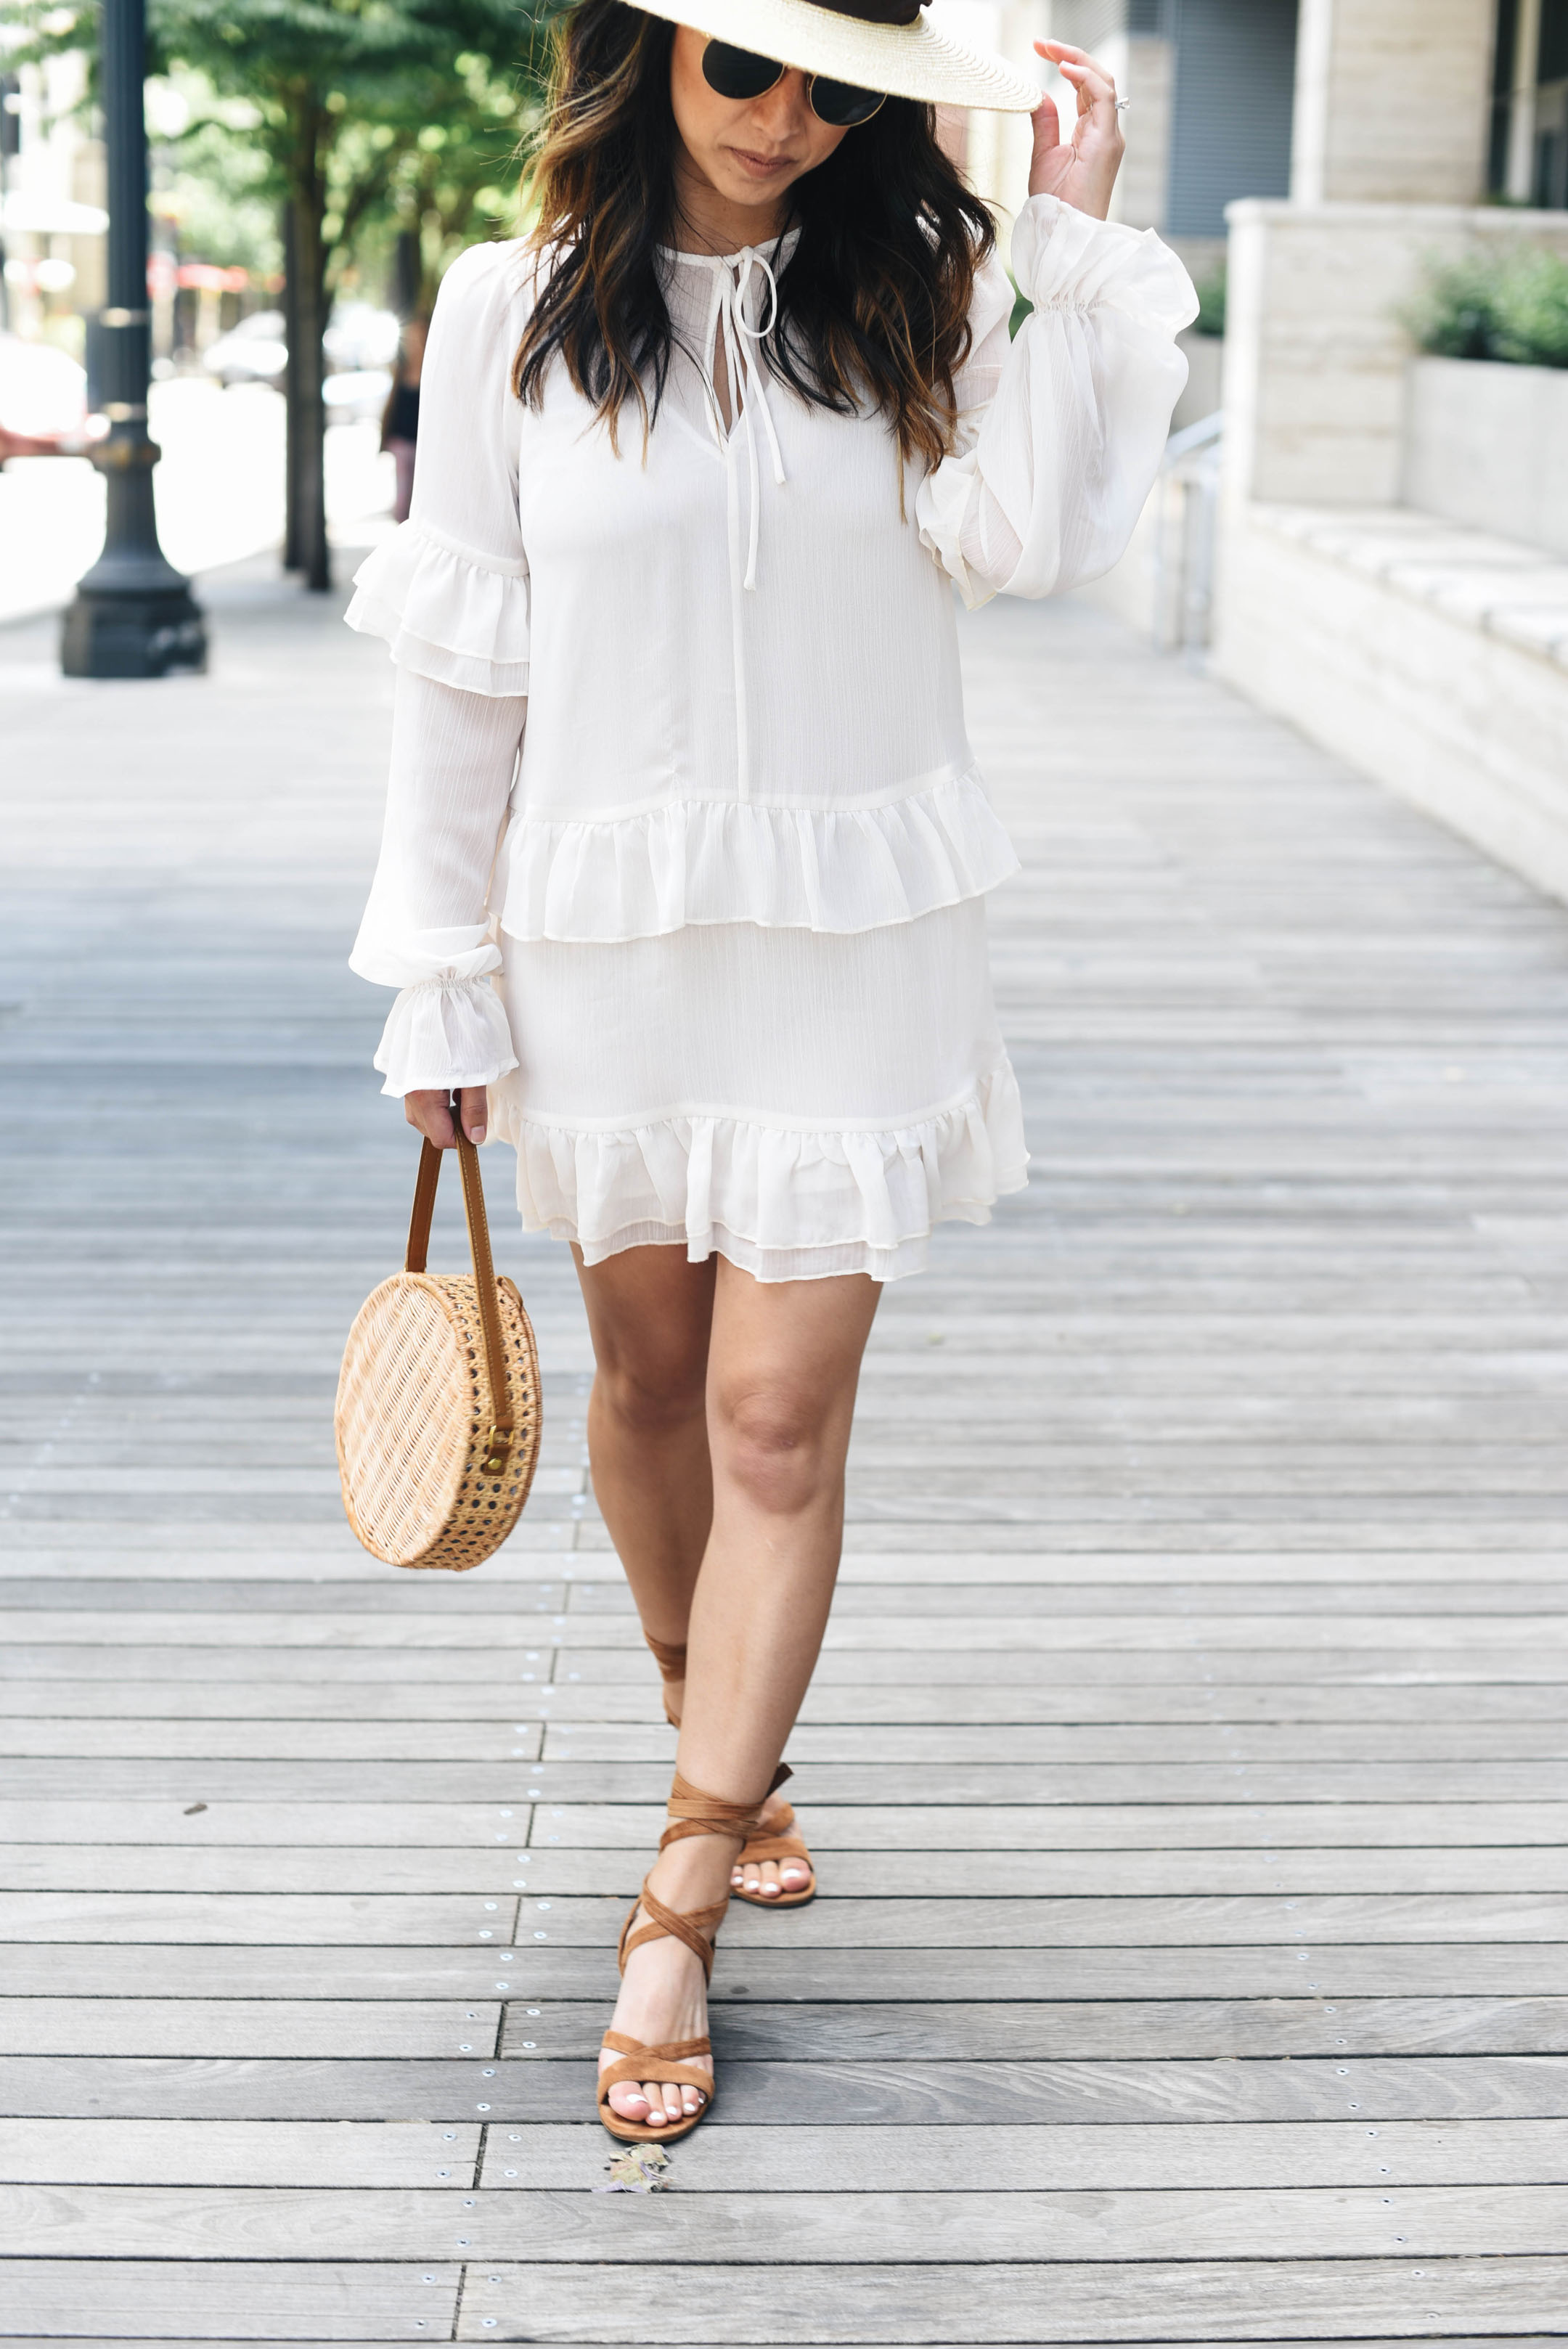 Petite friendly white dresses